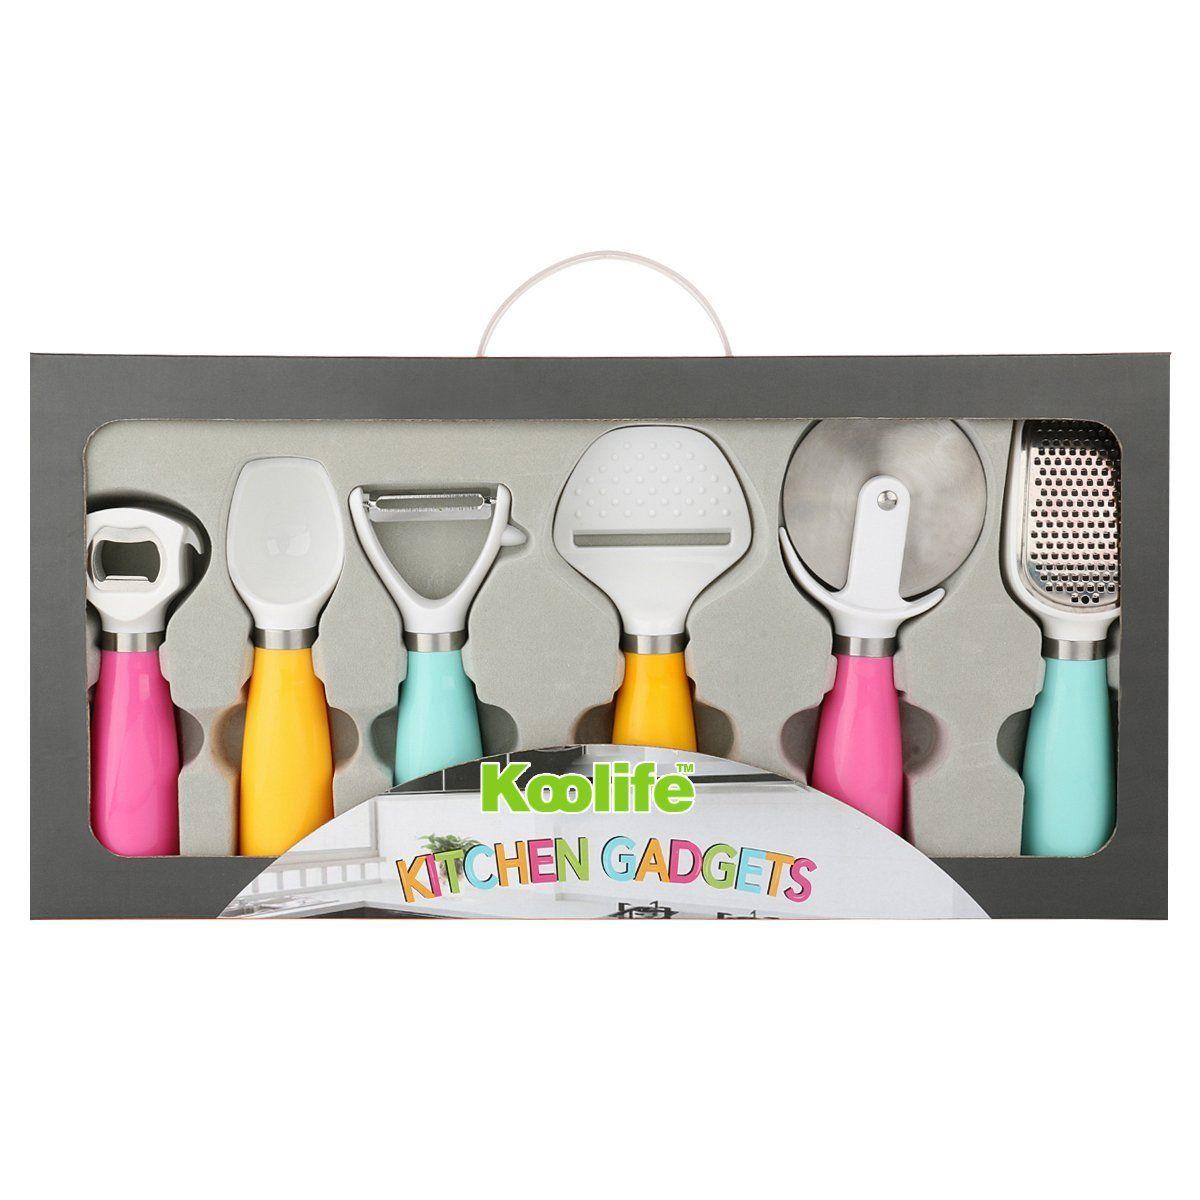 Funny grab shaped multi purpose fruits vegetable peeler bottle opener - Amazon Com Koolife 6 Pieces Kitchen Gadgets Tools Set Bottle Opener